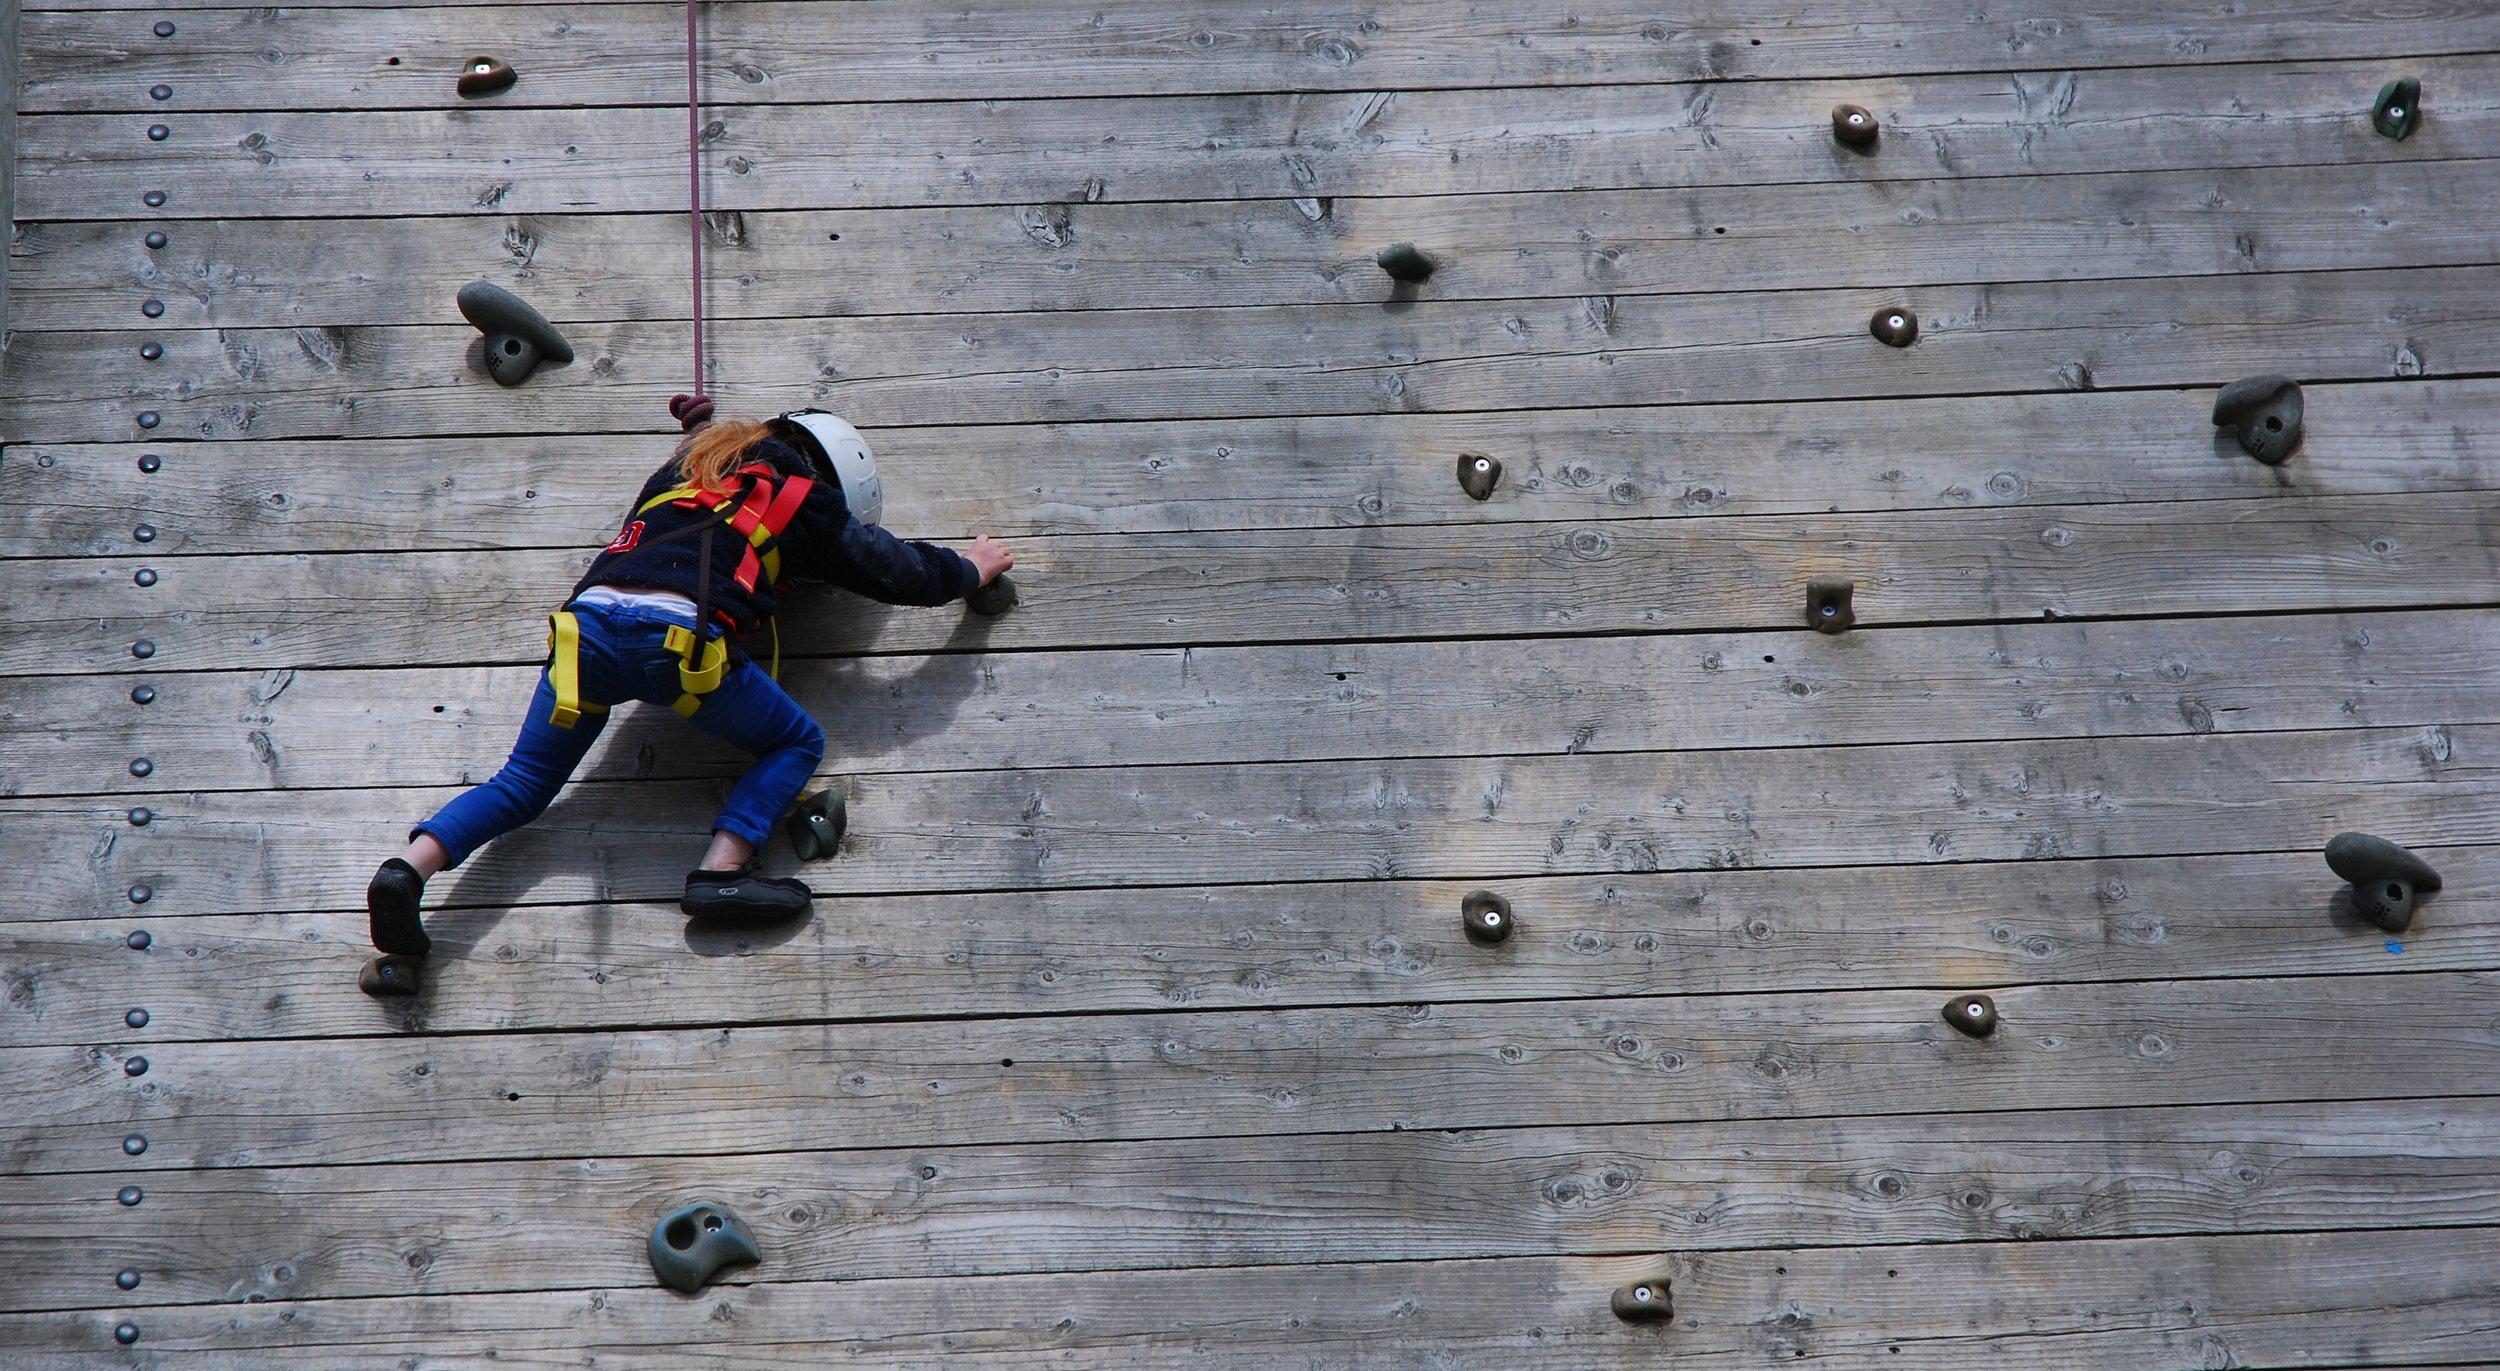 Mini climber, Galloway Sailing Centre